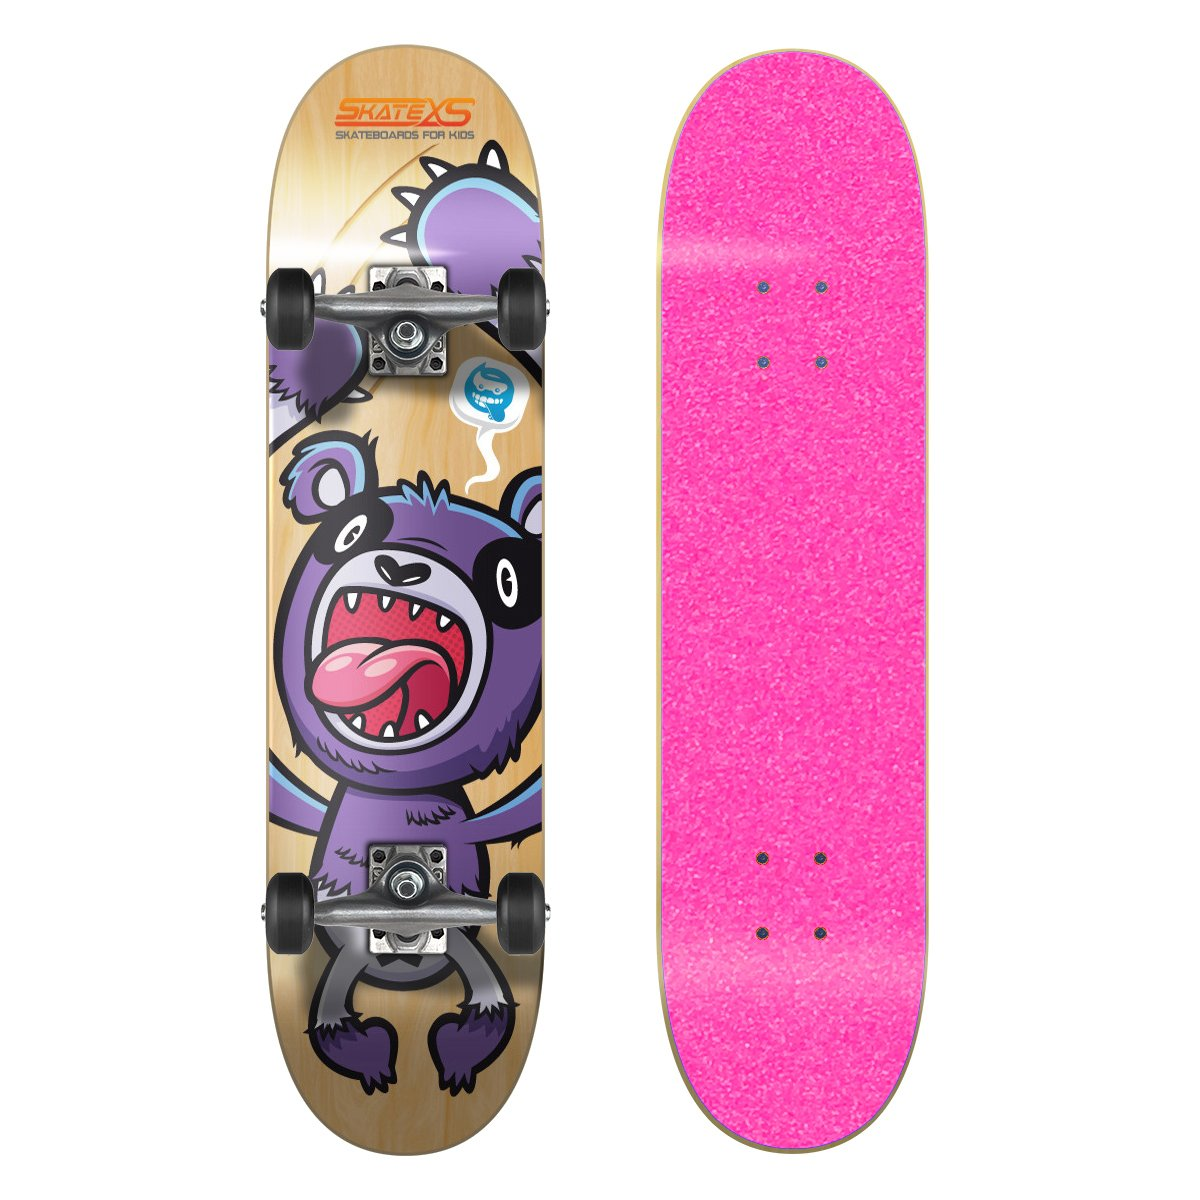 SkateXS 初心者 パンダ ストリート 11-12)|Pink キッズ 7.4 スケートボード B00YG1VXOG 11-12) 7.4 x 30 (Ages 11-12)|Pink Grip Tape/ Black Wheels Pink Grip Tape/ Black Wheels 7.4 x 30 (Ages 11-12), ニューズ タイヤ&ホイールズ:373e53ec --- harrow-unison.org.uk